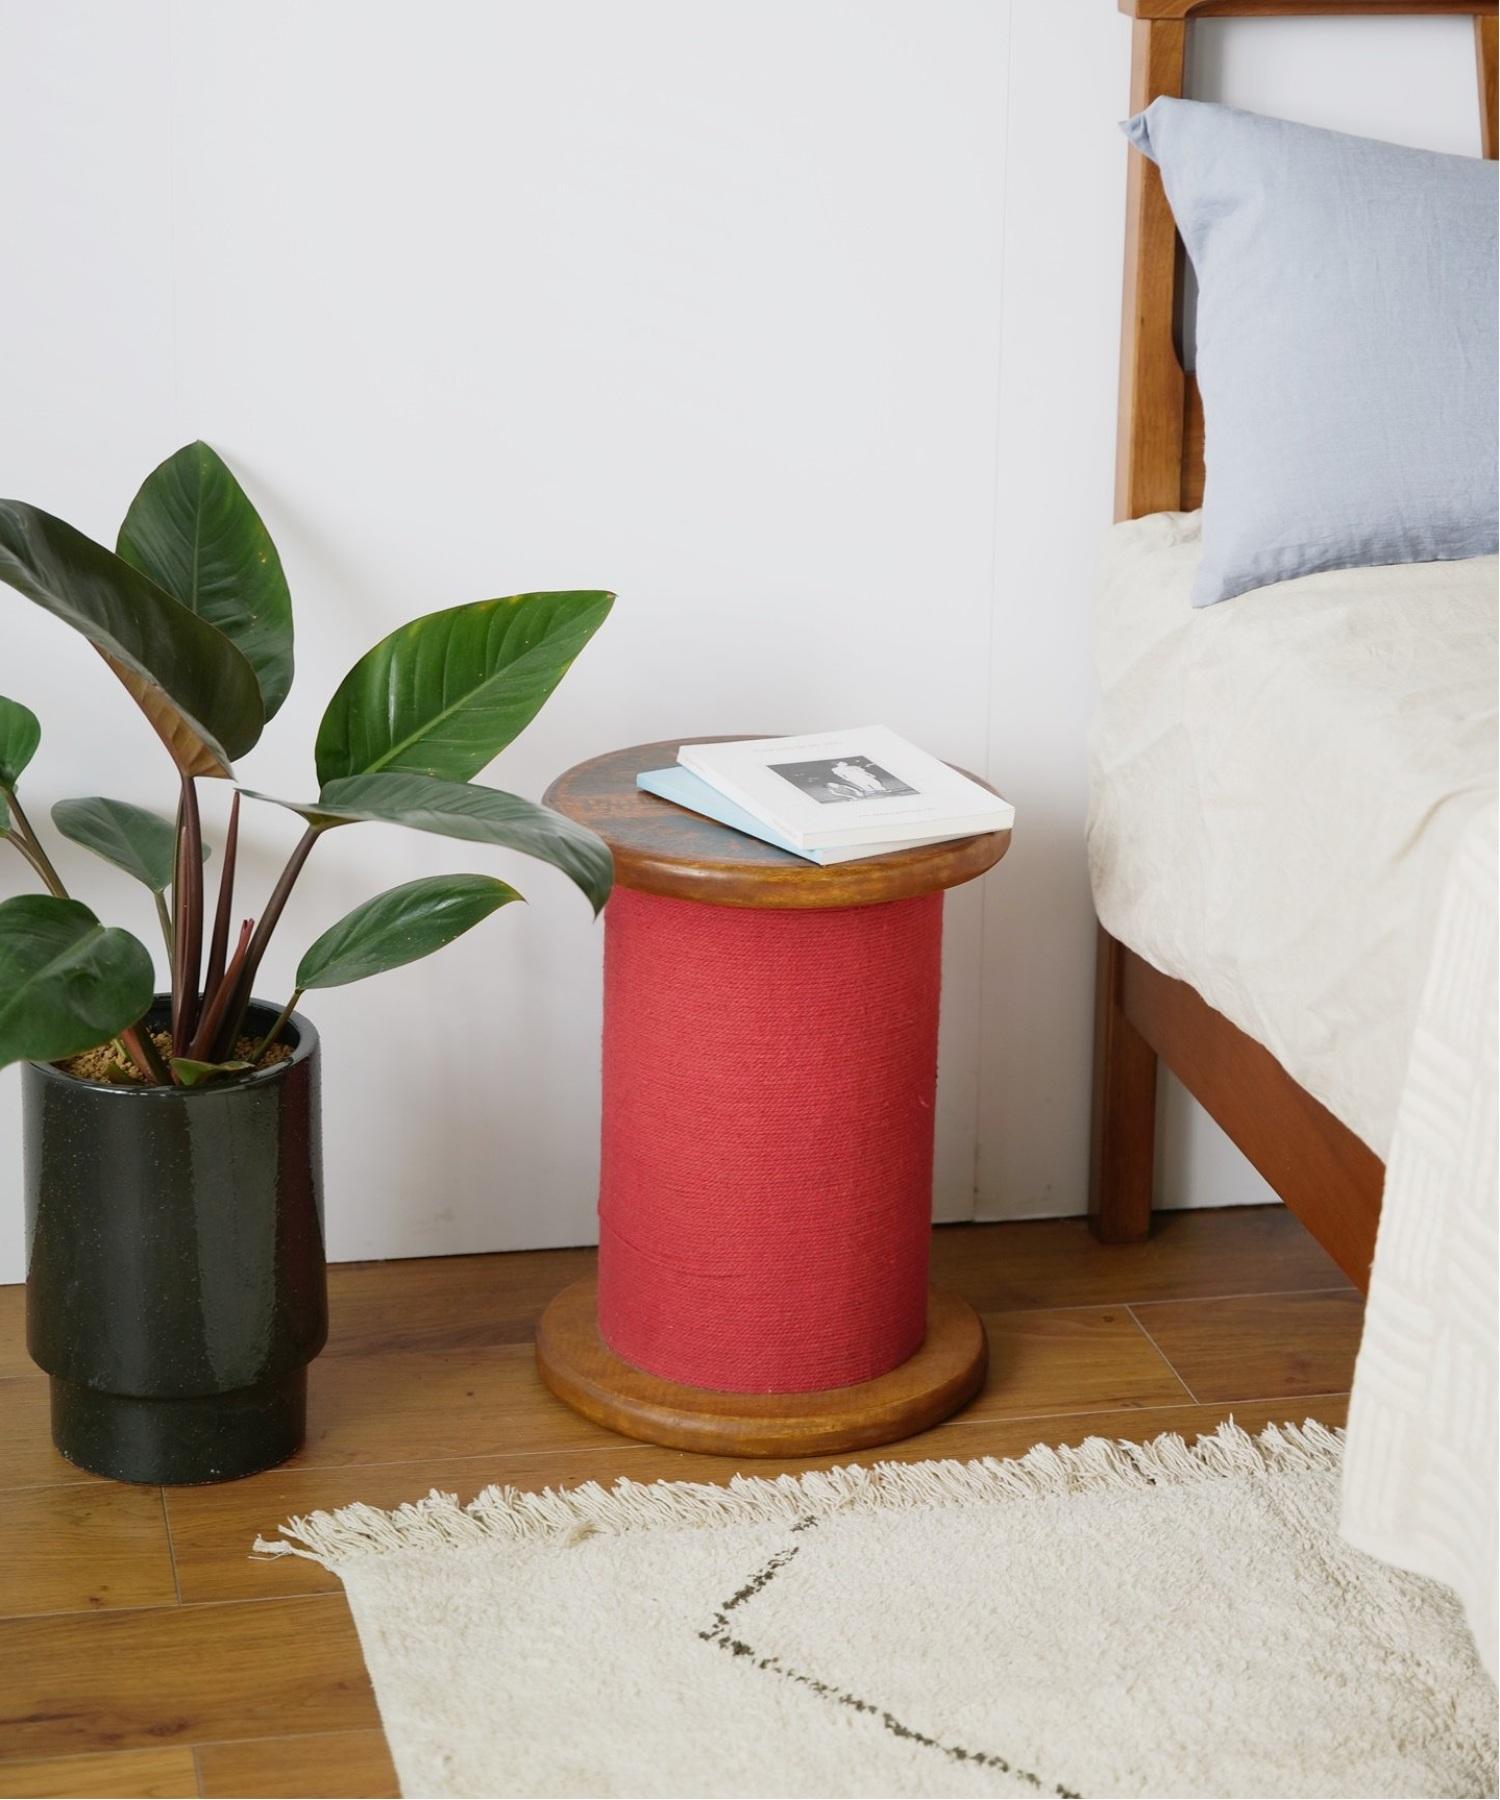 journal standard Furniture ジャーナルスタンダードファニチャー 家具 BRIM SPOOL STOOL ブリムスプールスツール